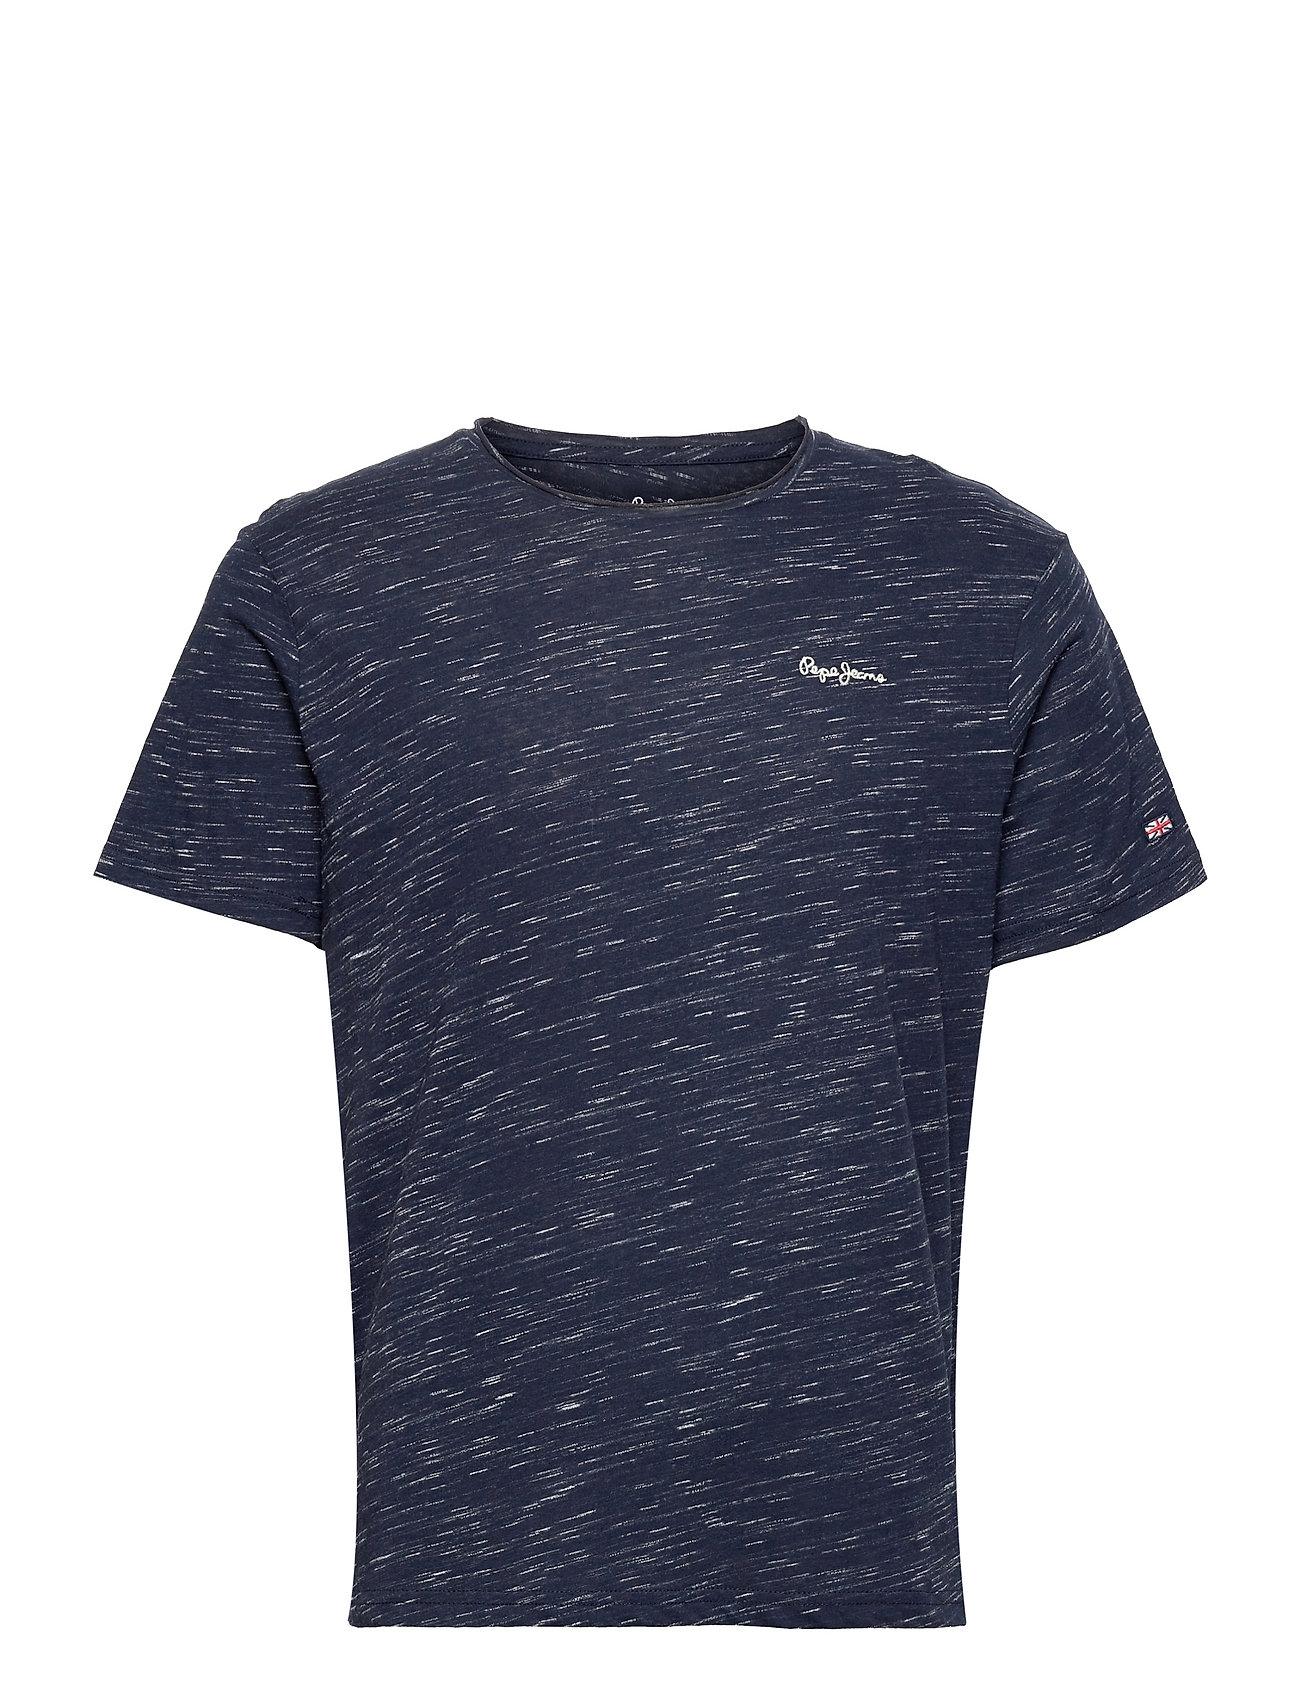 Image of Paul 4 T-shirt Blå Pepe Jeans London (3539795231)